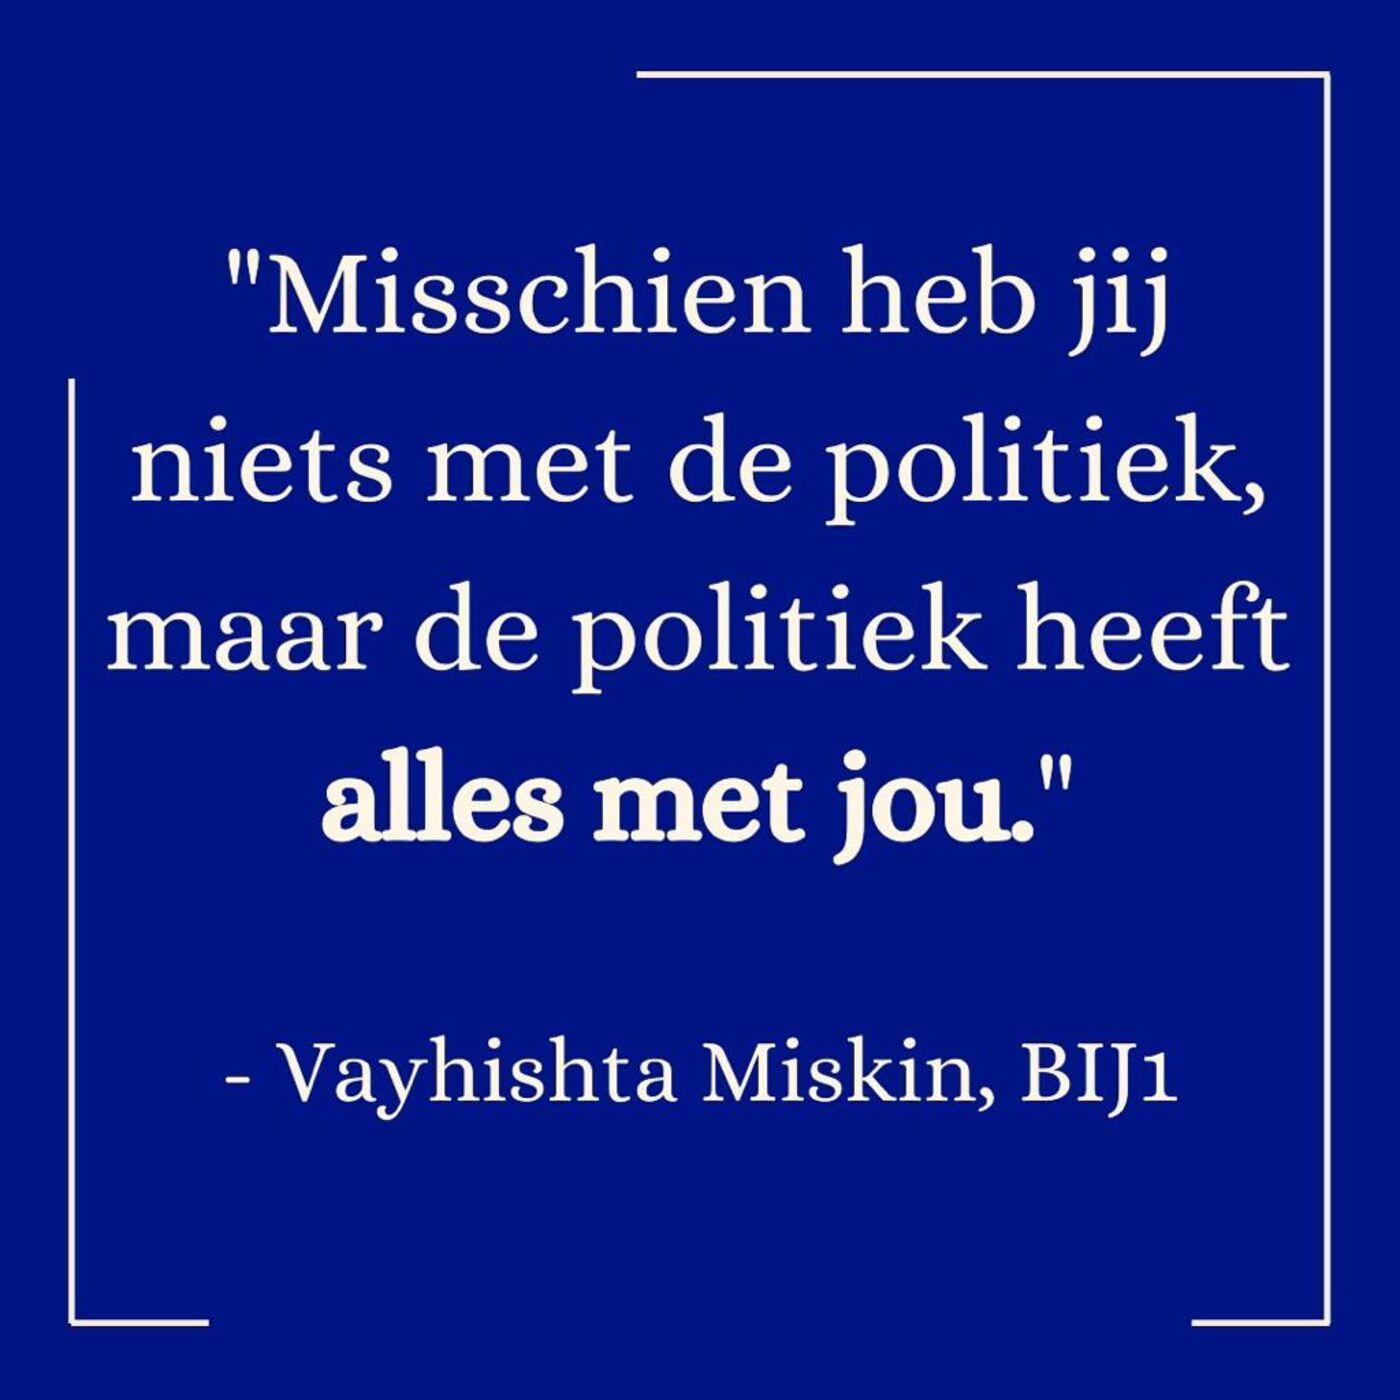 Go Vote #1: Vayhishta Miskin (Bij1)